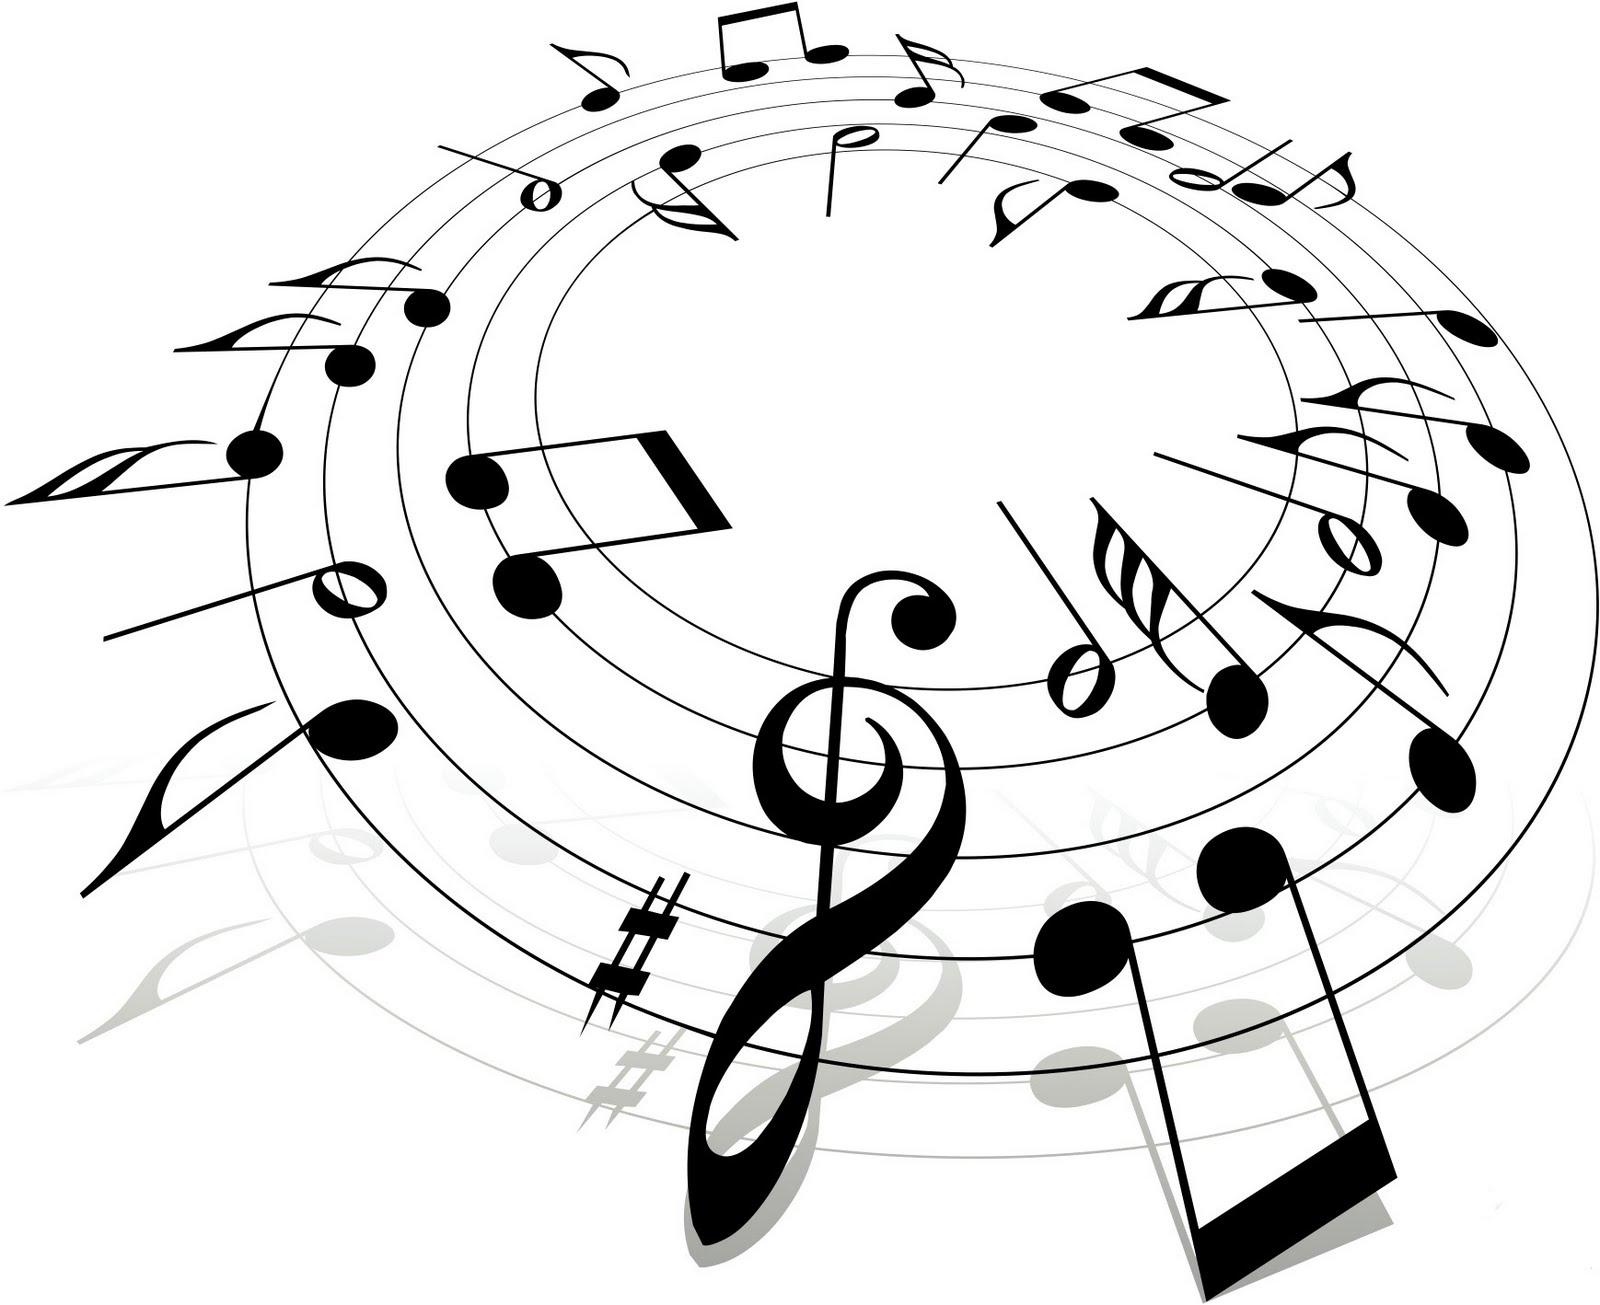 Choir clipart chamber choir. Salisbury singers by way